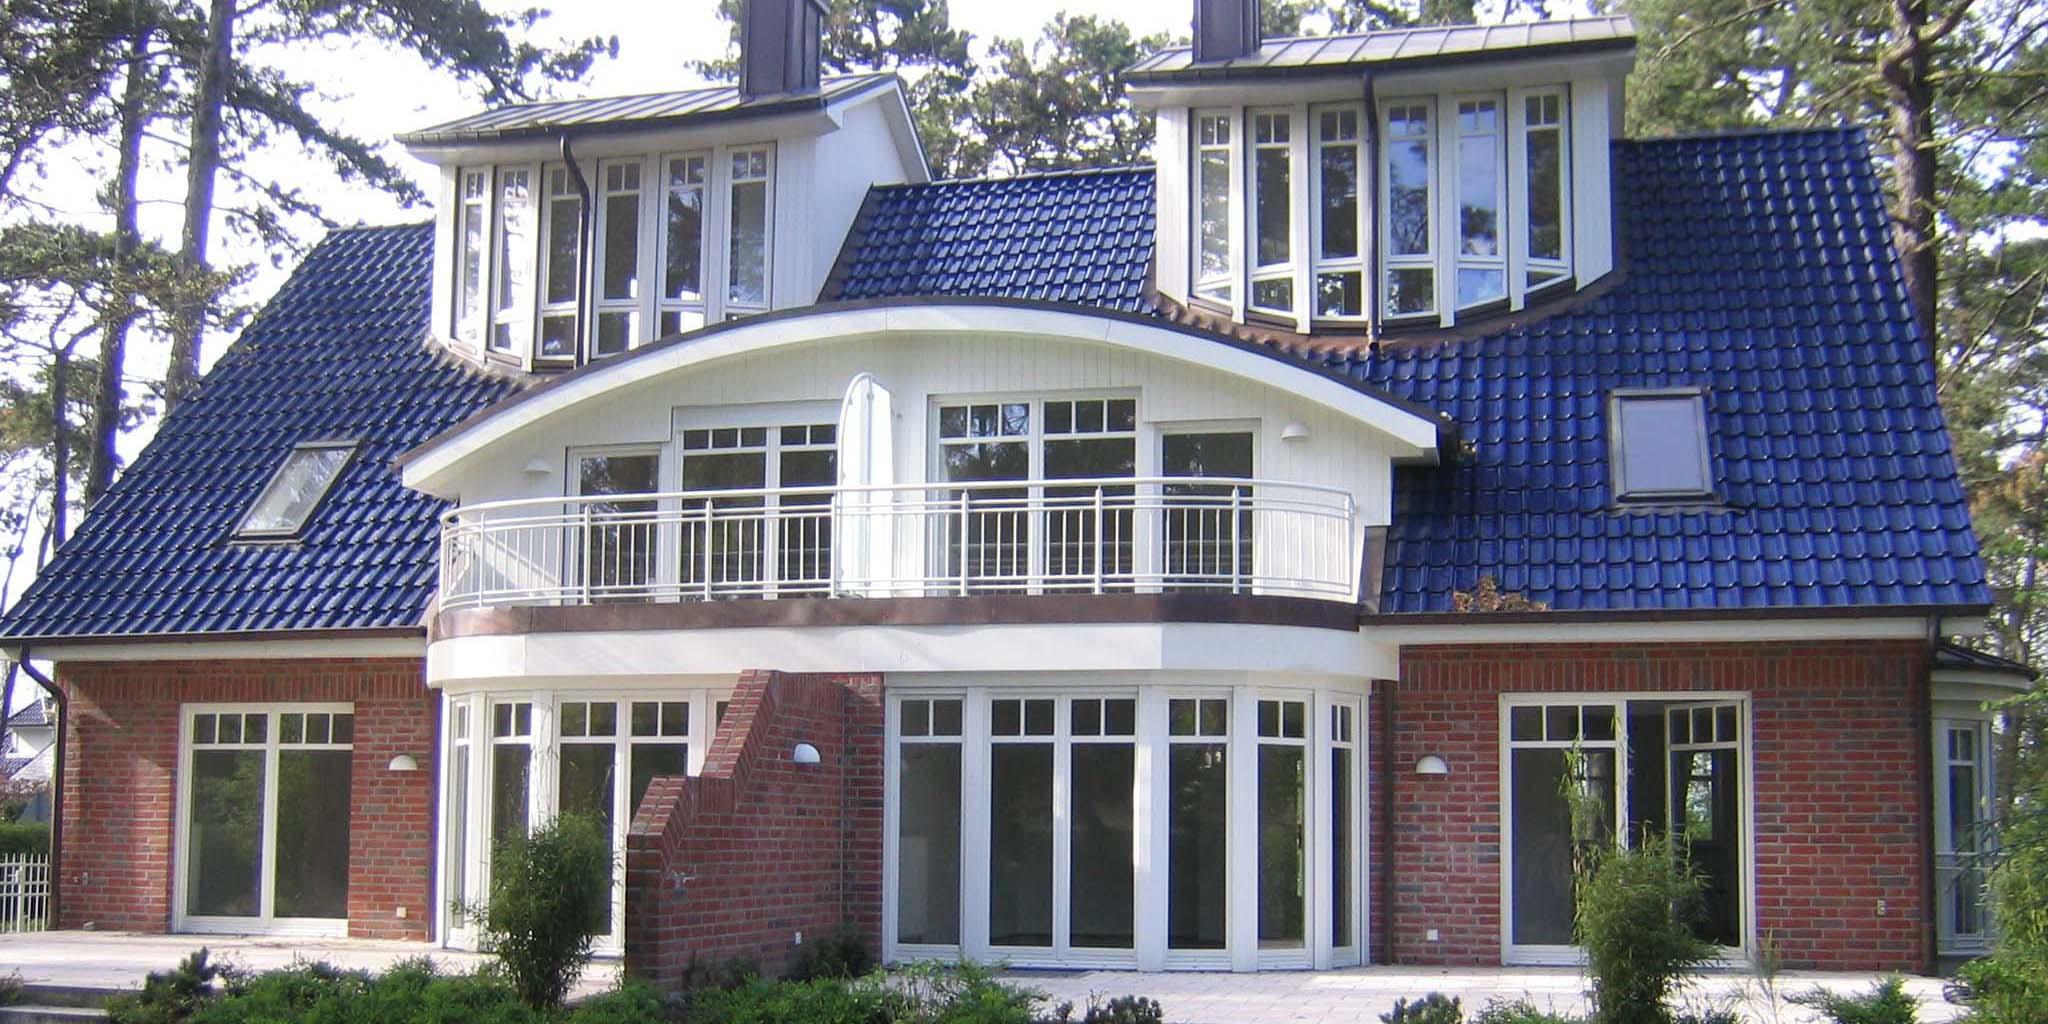 Immobilienmakler in Münster-Wohnimmobilie